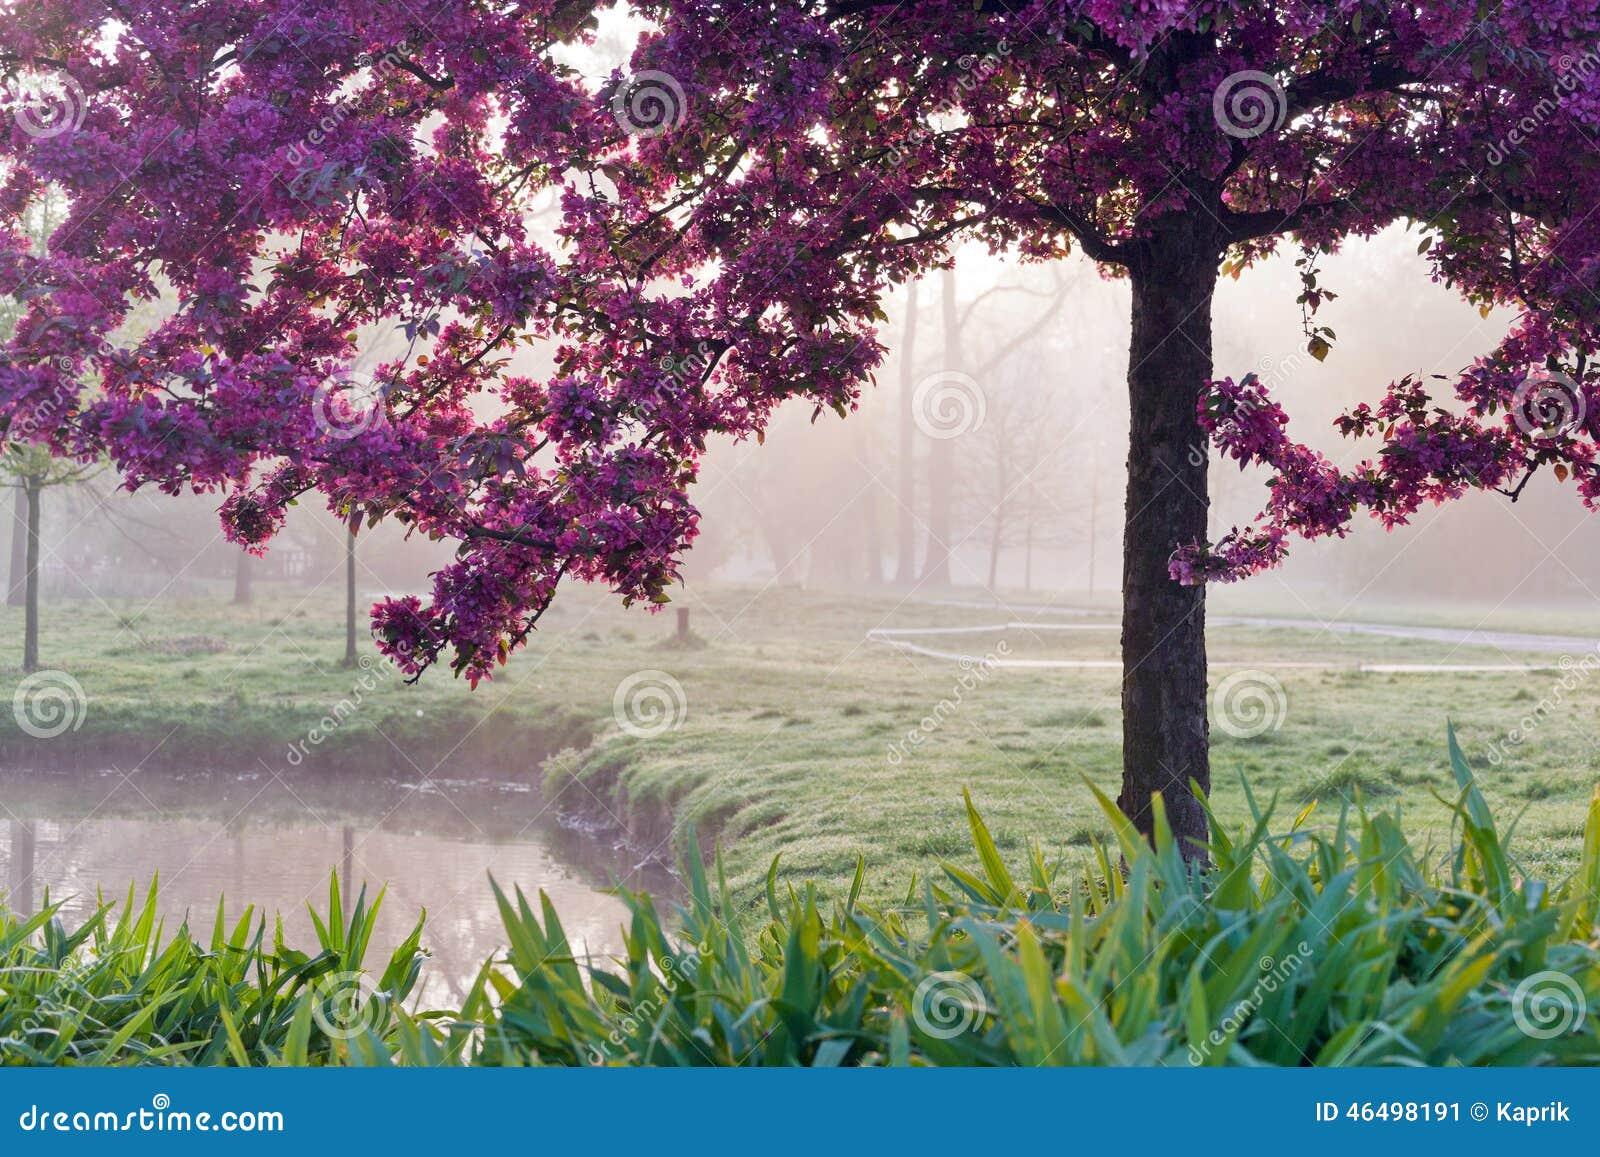 arbre japonais rose dans la lumi re de matin jardin. Black Bedroom Furniture Sets. Home Design Ideas